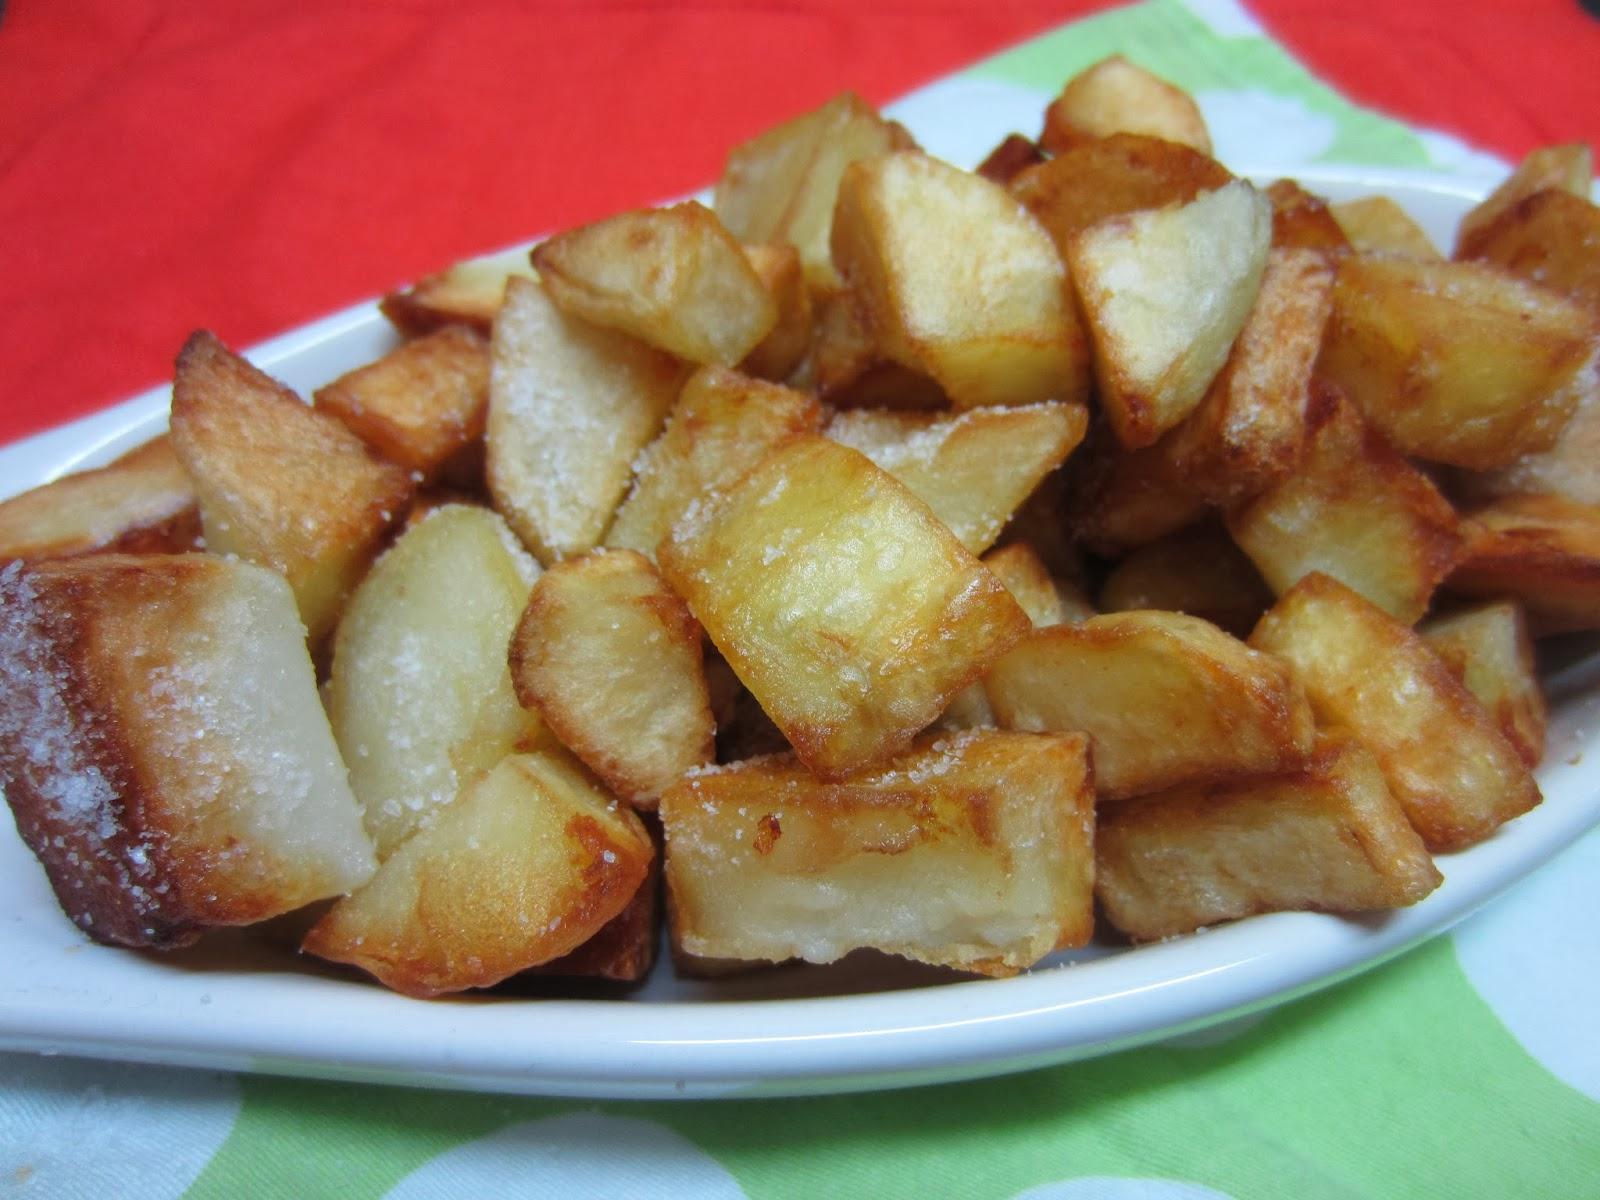 Recetas de la abuela: Fried potatoes in olive oil